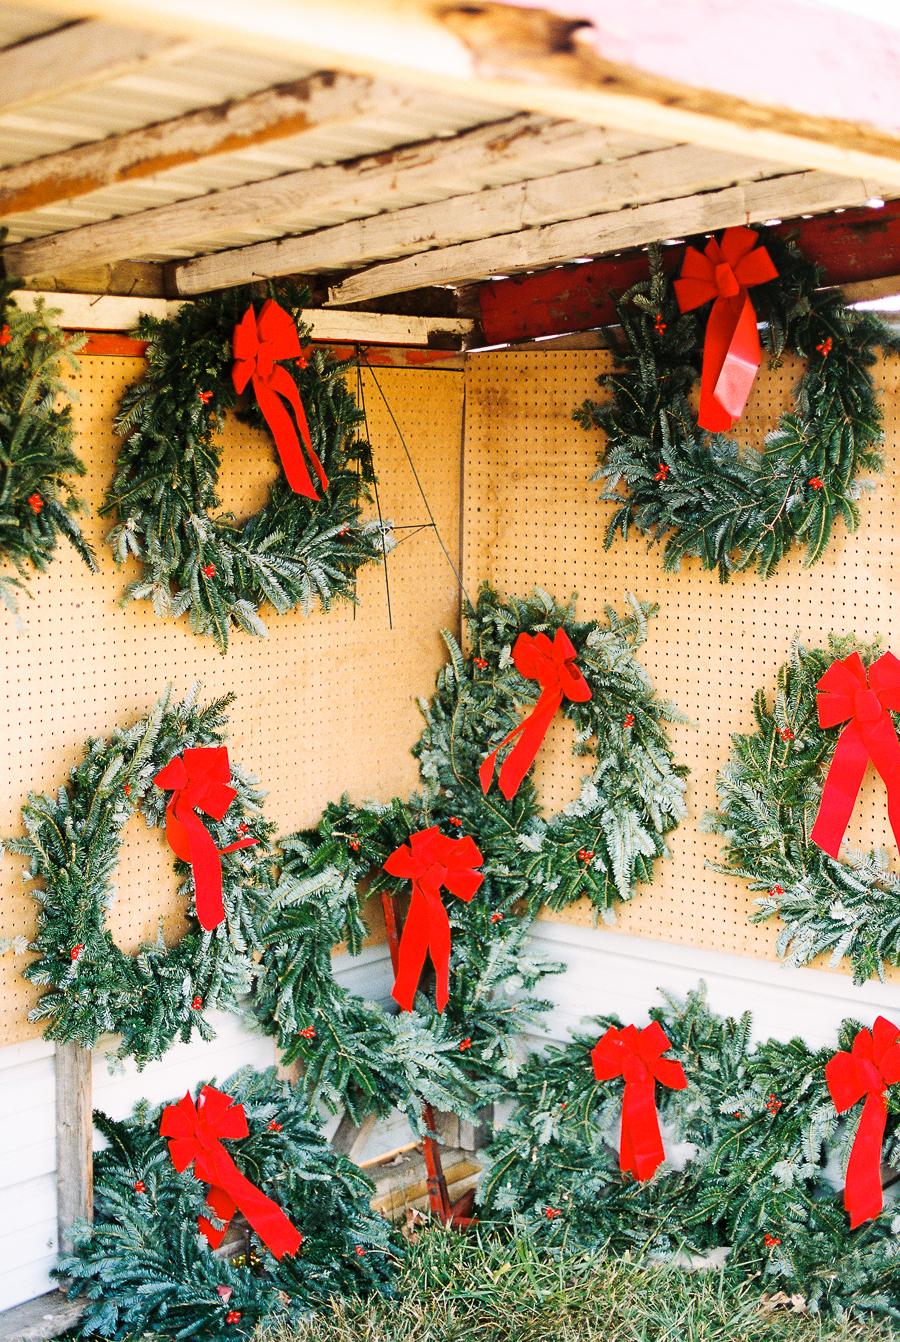 2016_11_27-ChristmasTree00048.jpg